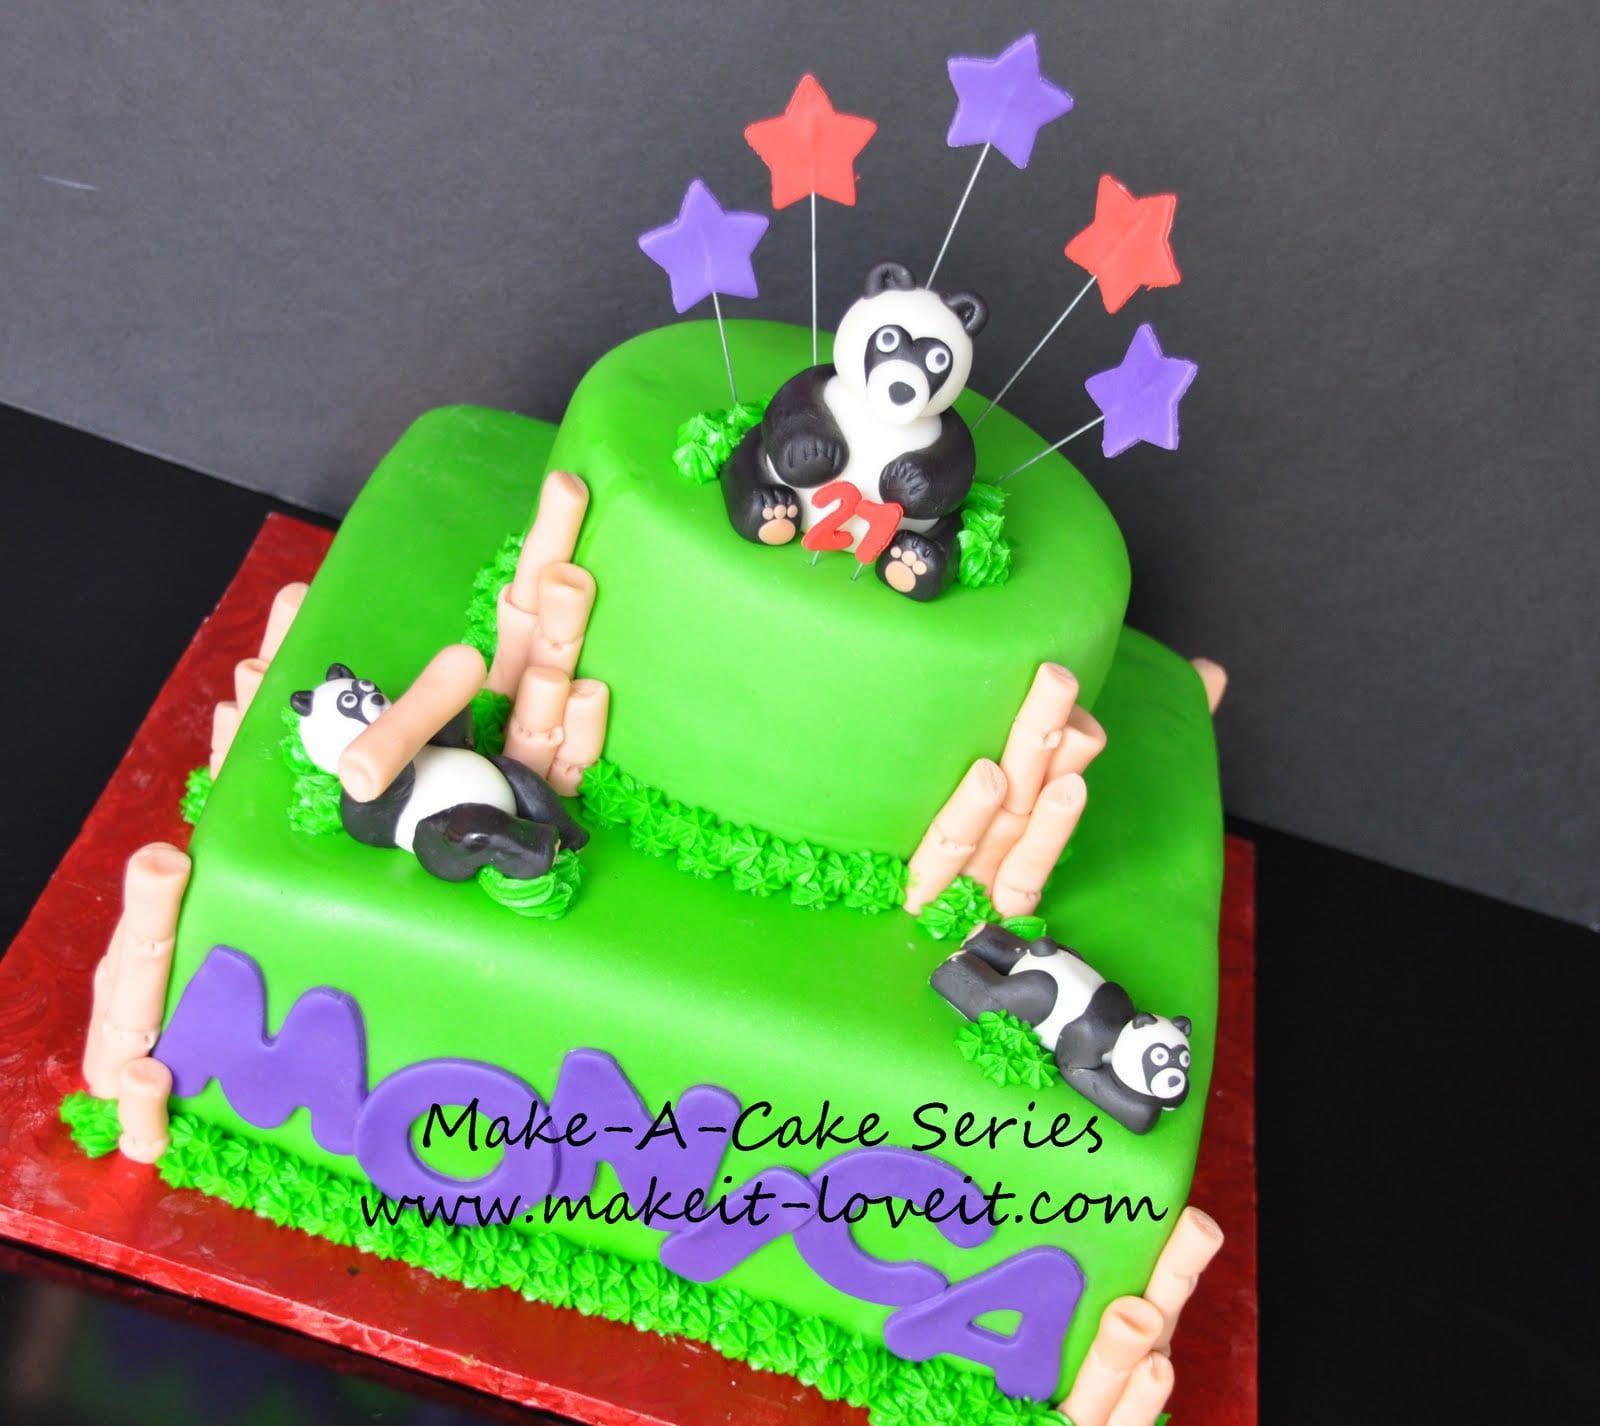 Make-a-Cake Series: Panda and Bamboo